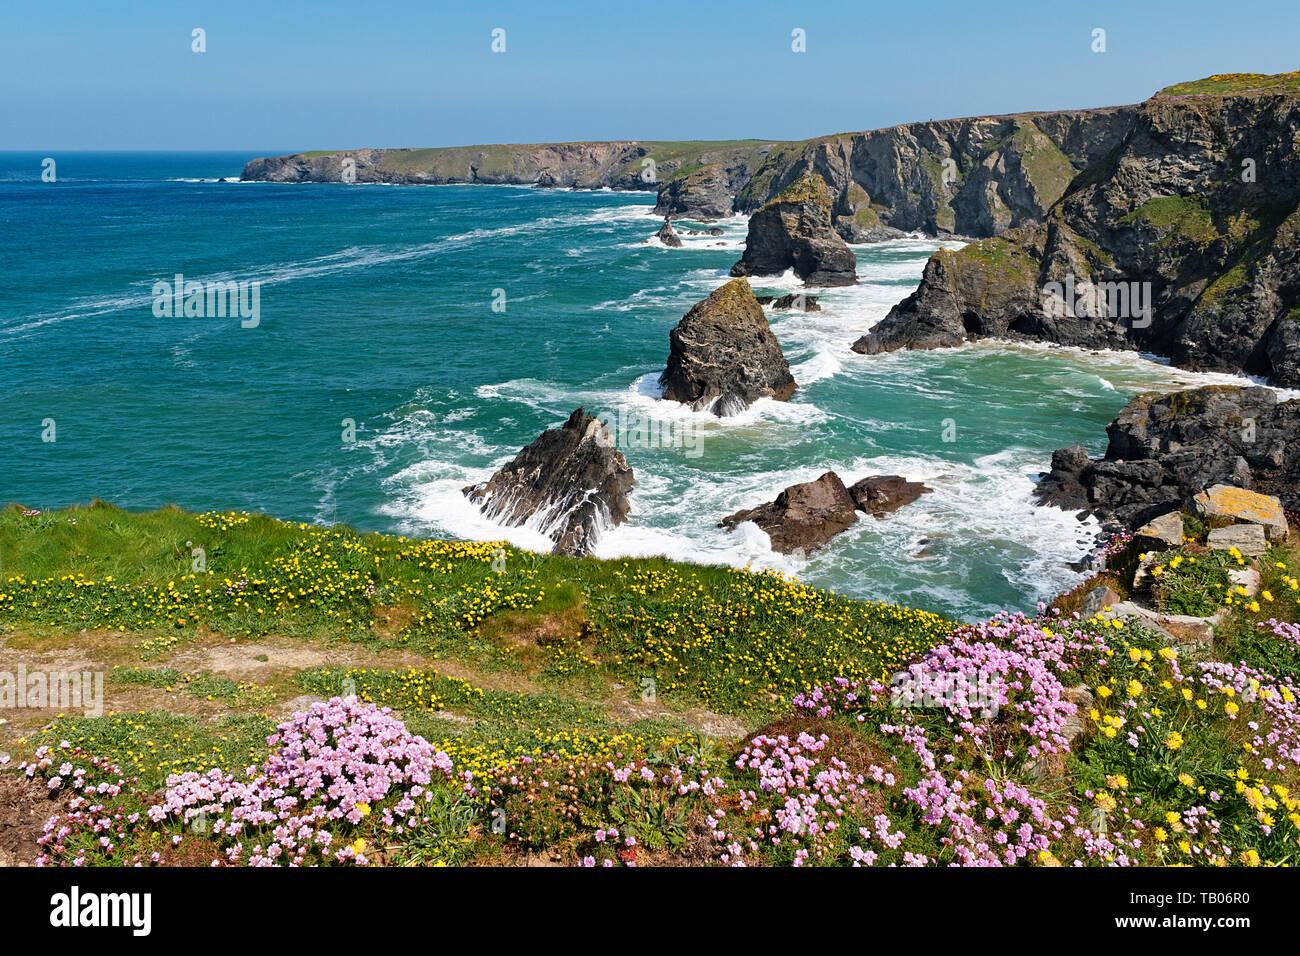 bedruthan, north coast, cornwall, england, britain, uk - Stock Image